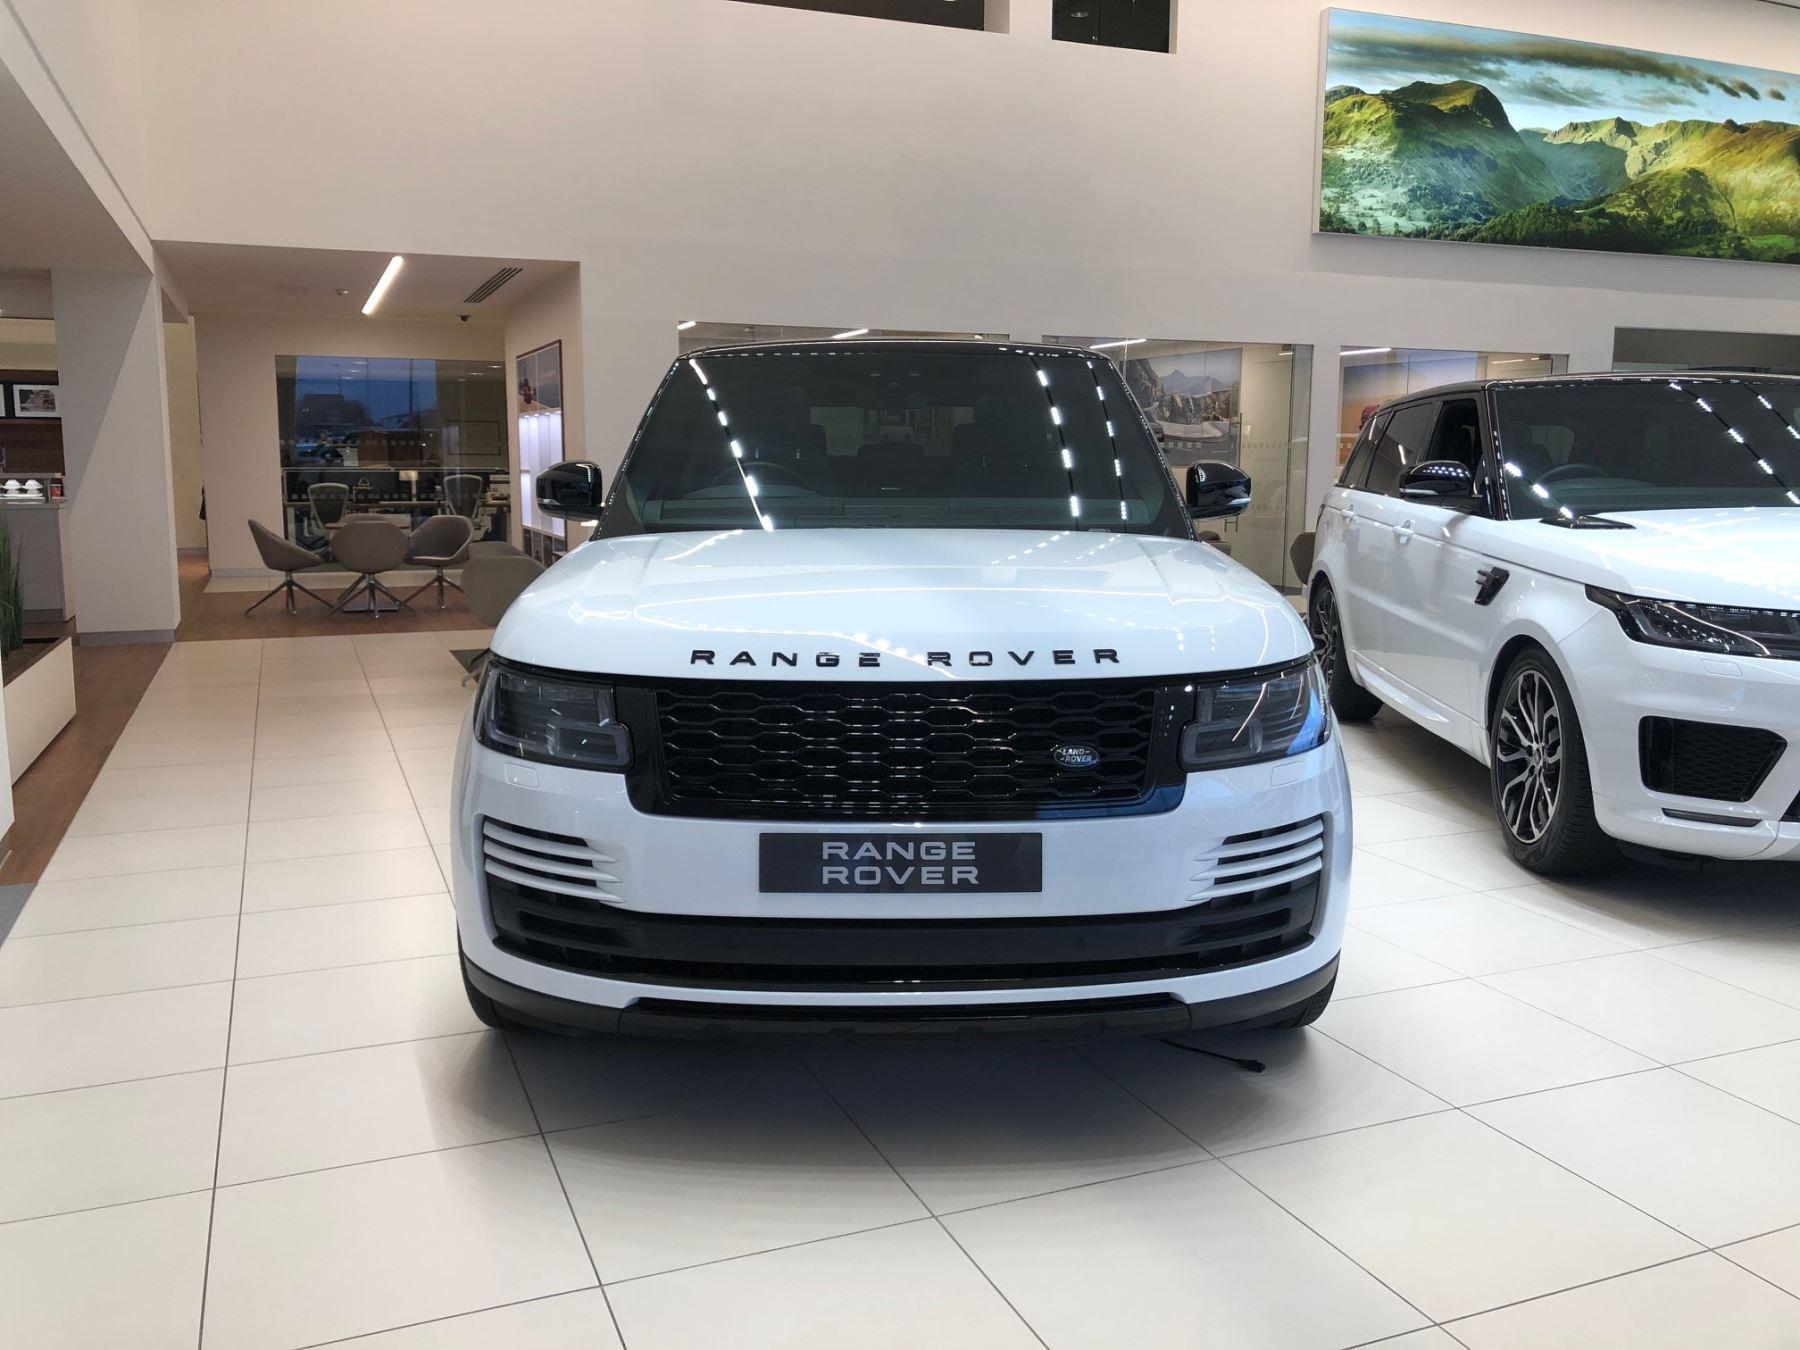 Land Rover Range Rover 3.0 SDV6 Vogue Diesel Automatic 4 door Estate (18MY)